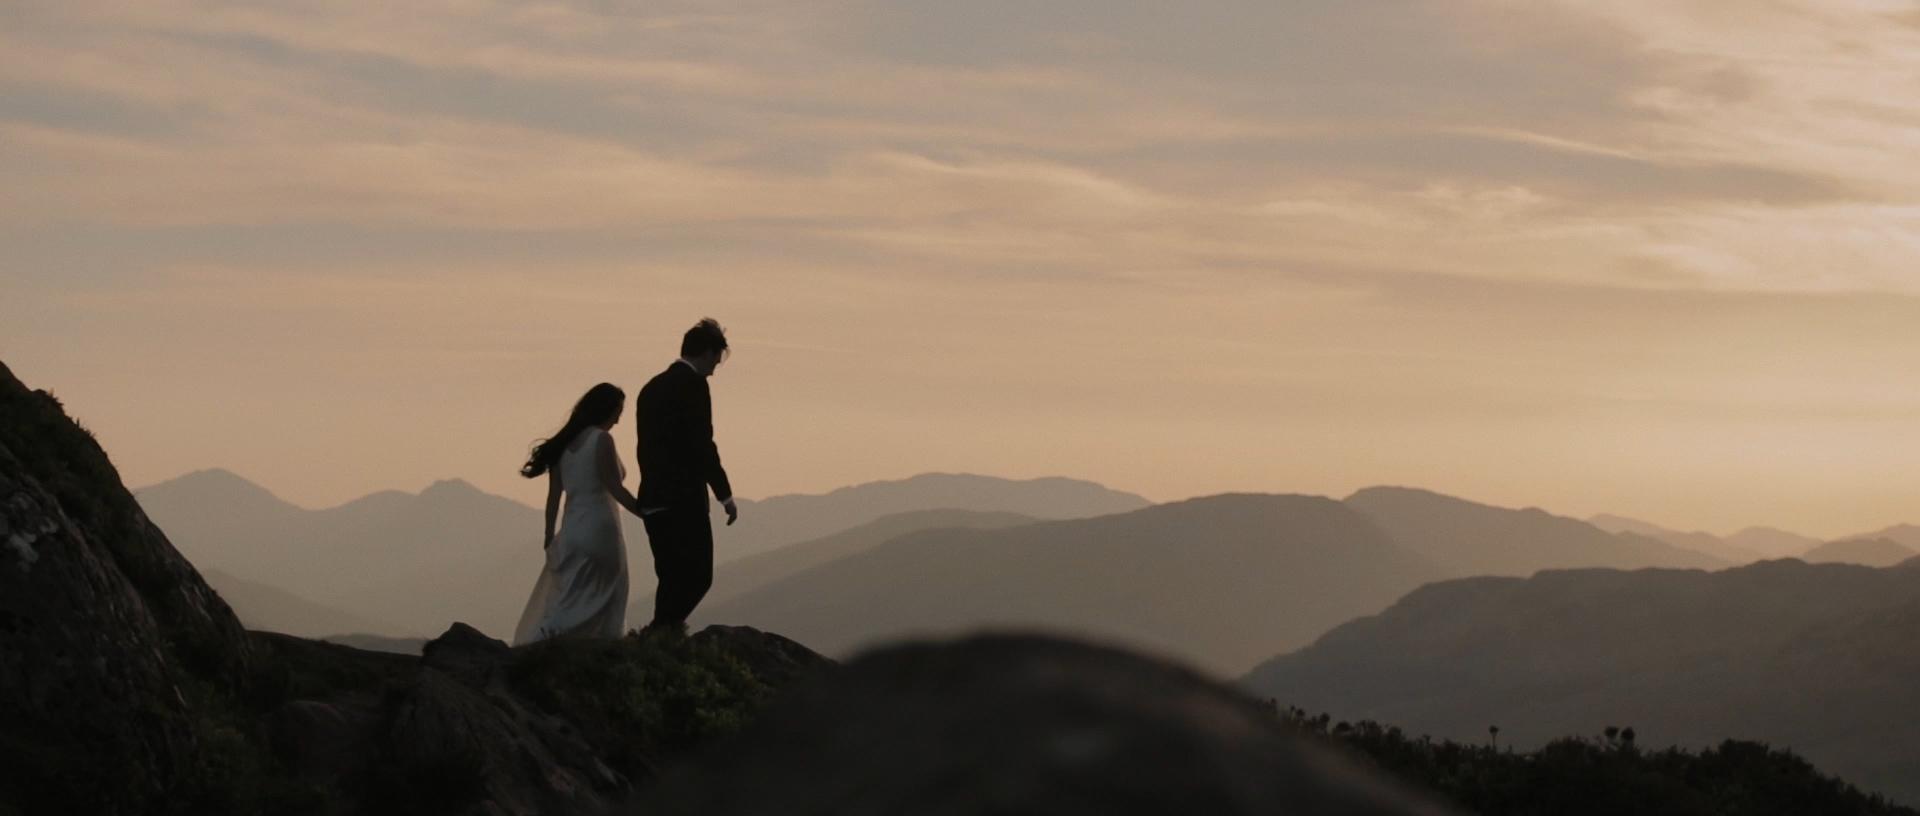 drygate-wedding-videographer_LL_01.jpg